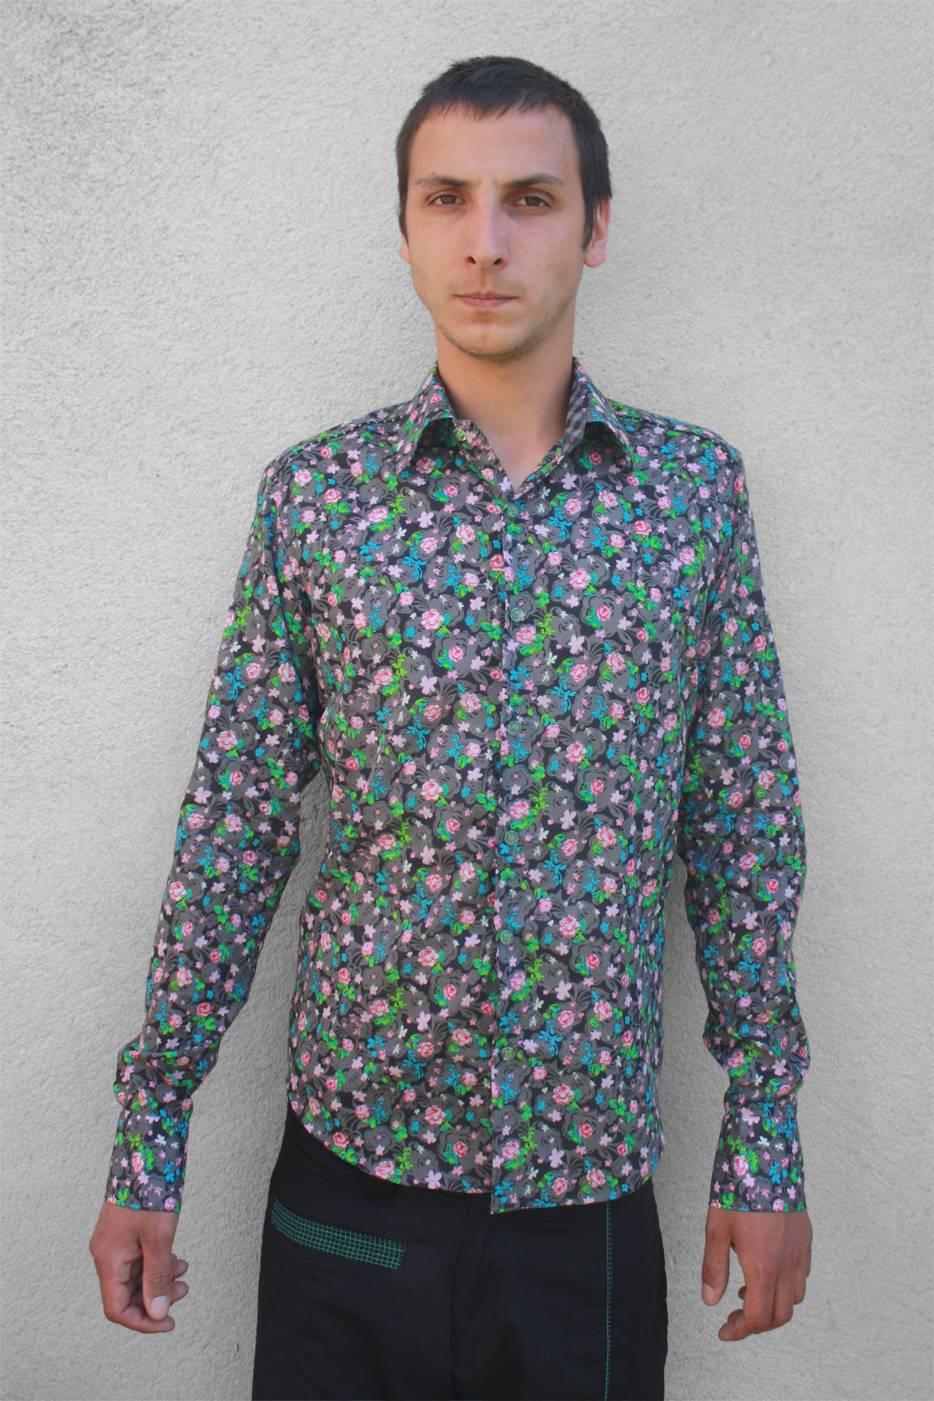 ab47c4b915 Baïsap - Camisas floreadas - Liberty - Camisas liberty hombre Compartir